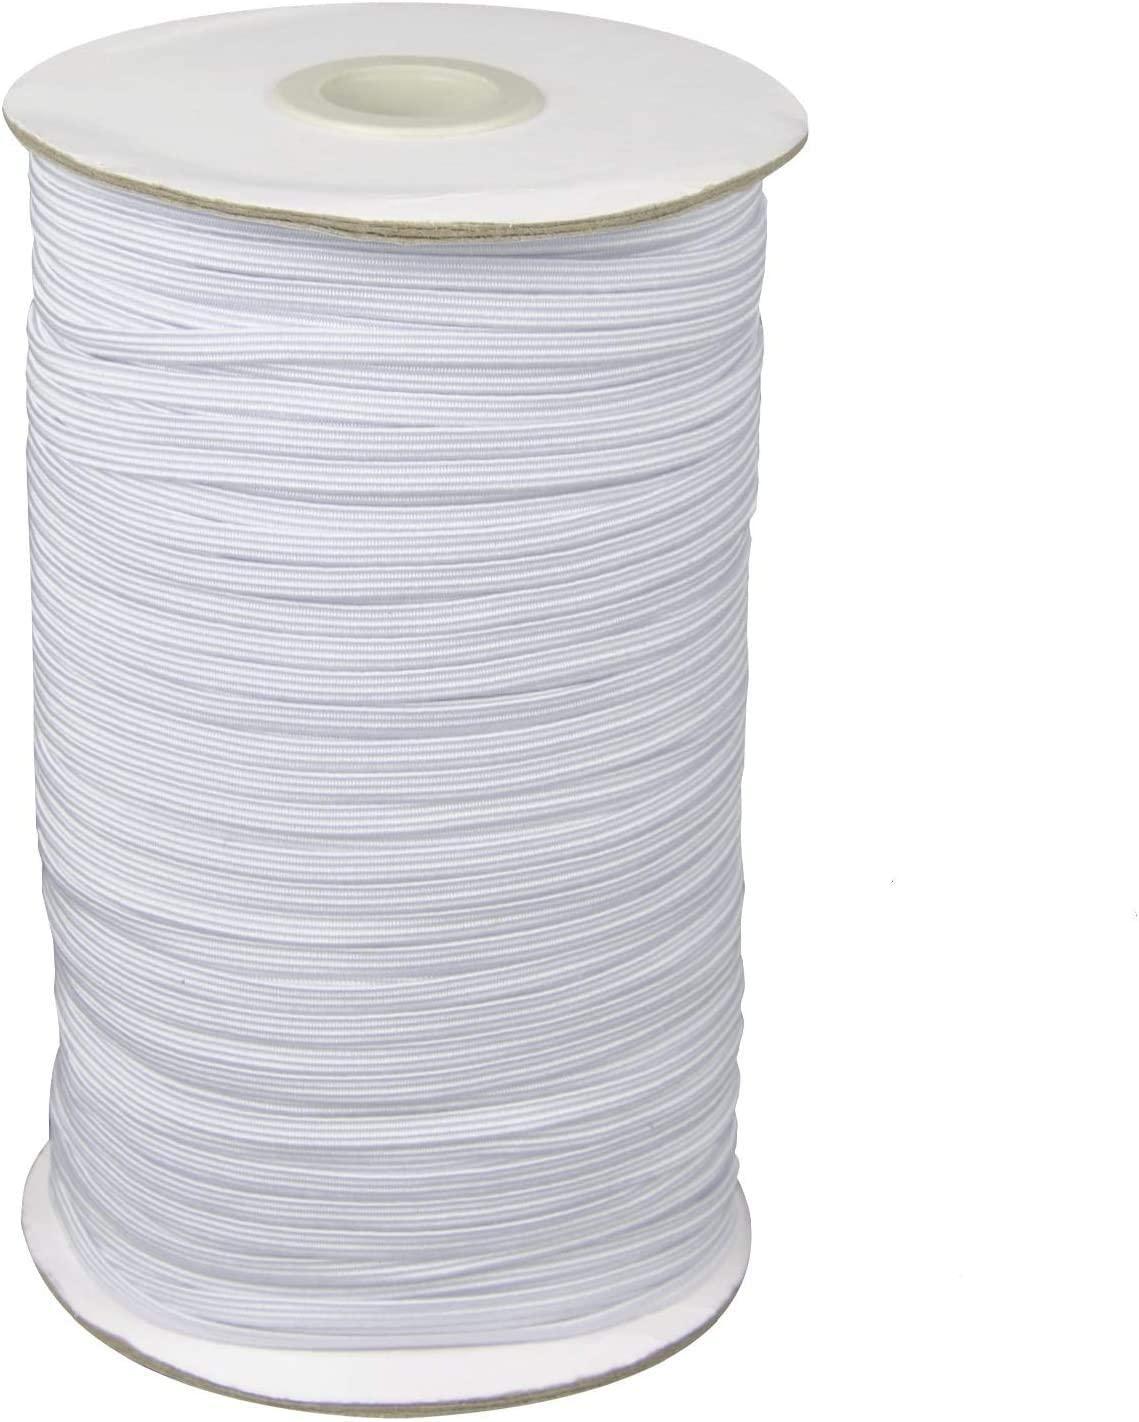 1/4 Width Braided Elastic Band Cord Elastic String 110 Yards Heavy Stretch High Elasticity Knit Elastic Band for Sewing Craft DIY - White